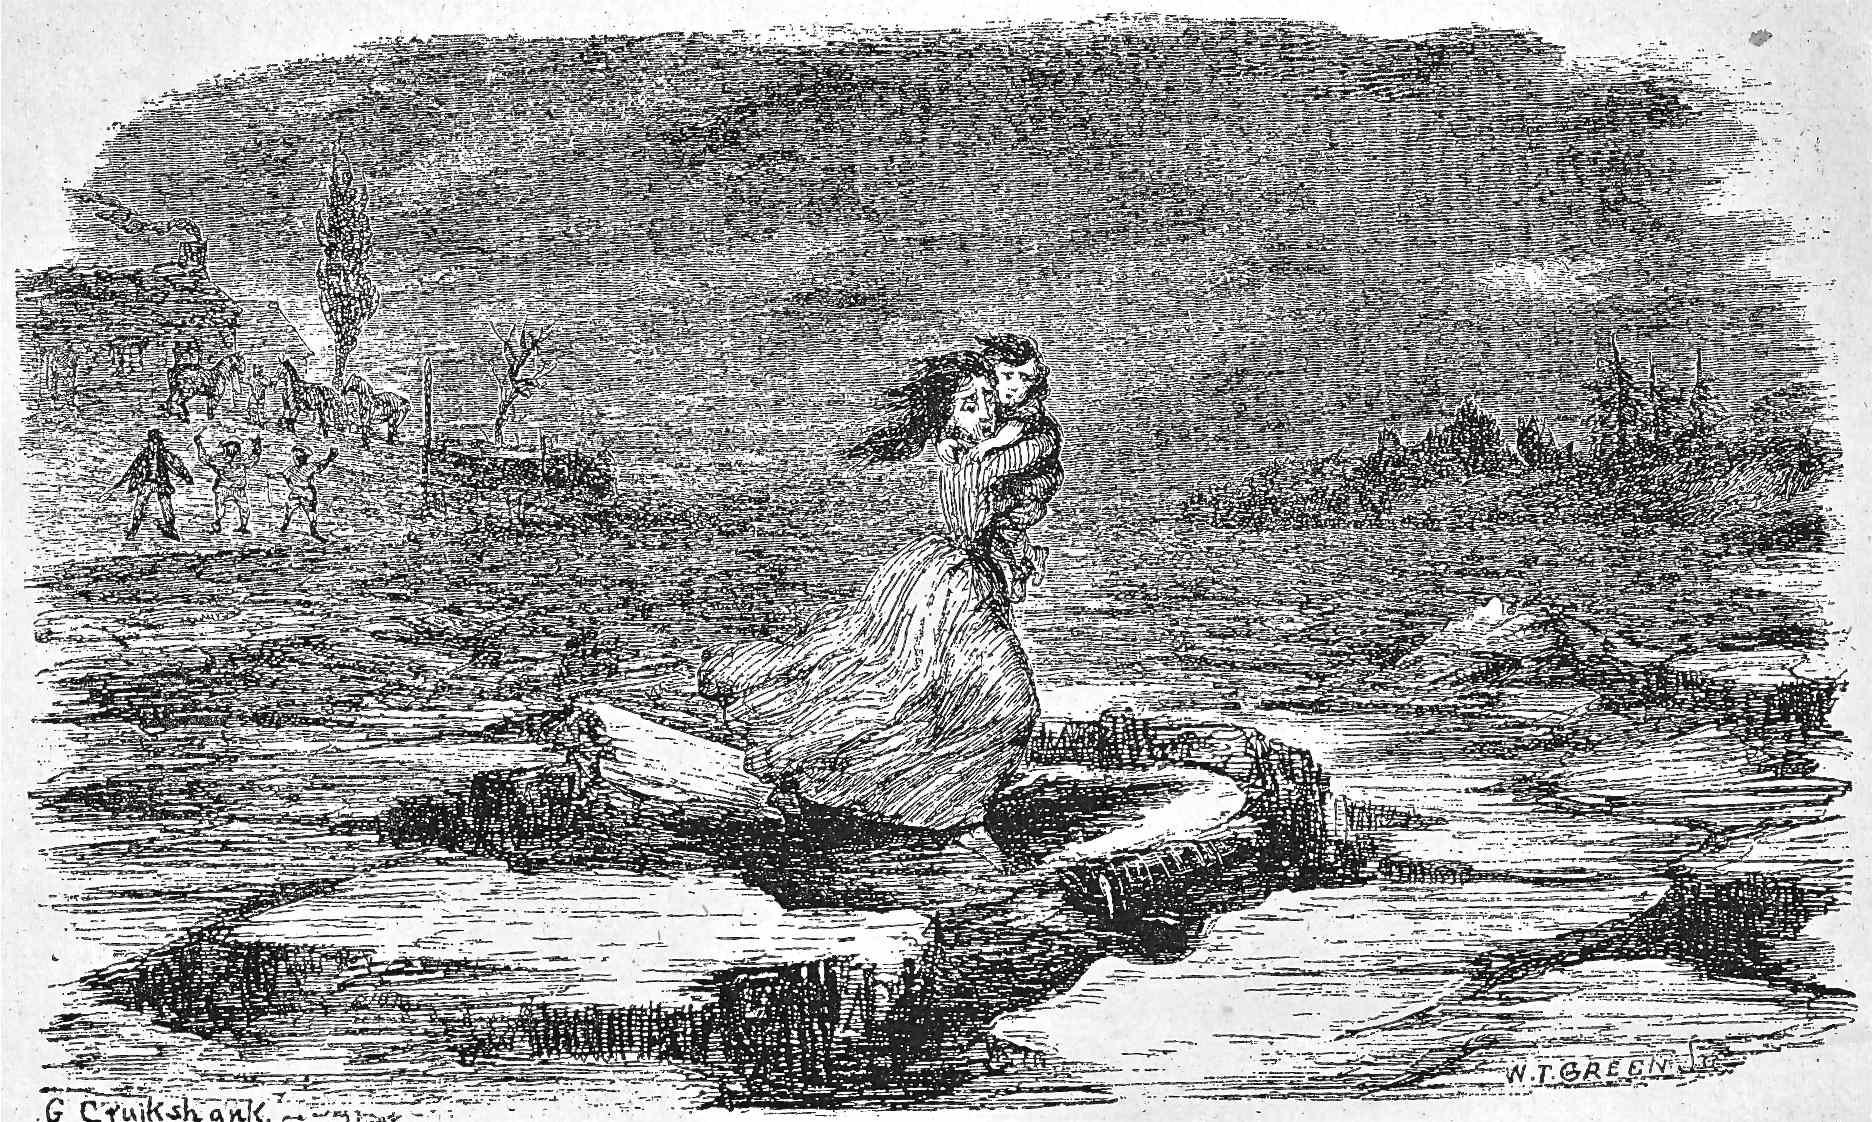 George Cruikshank: Eliza Crosses the Ohio on the Floating Ice